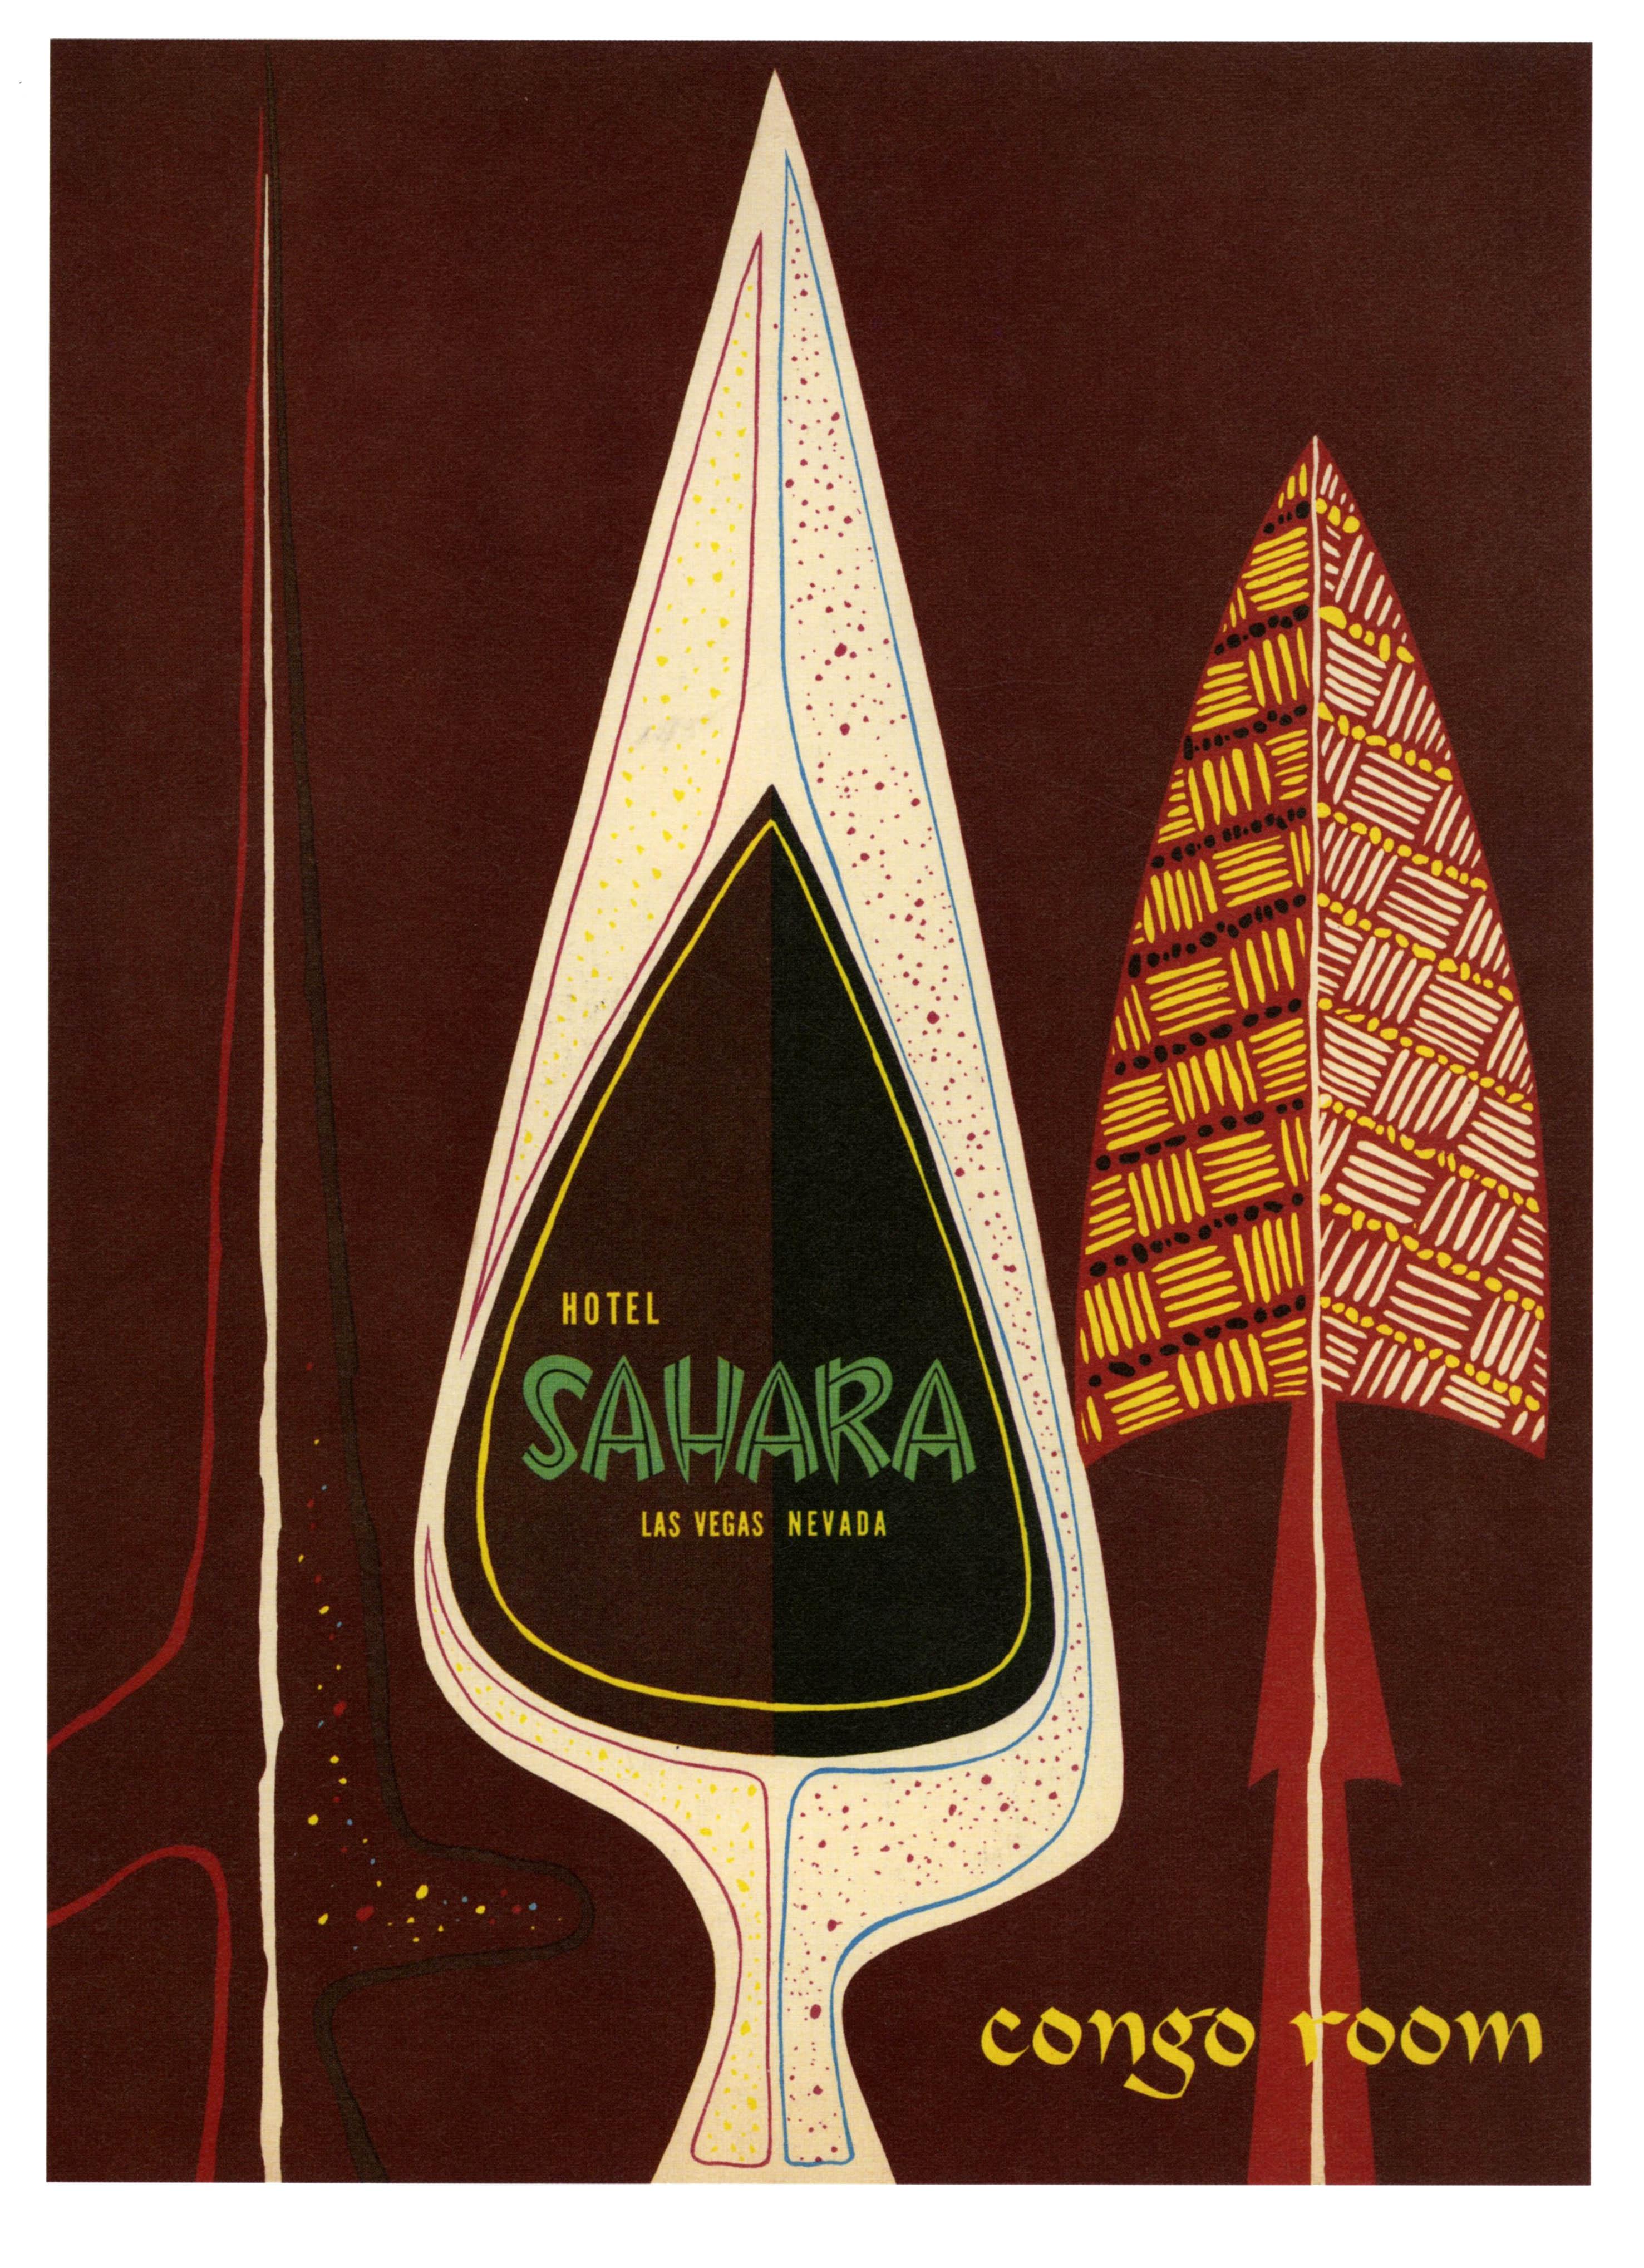 Sahara Hotel Congo Room - Las Vegas, Nevada U.S.A. - 1954